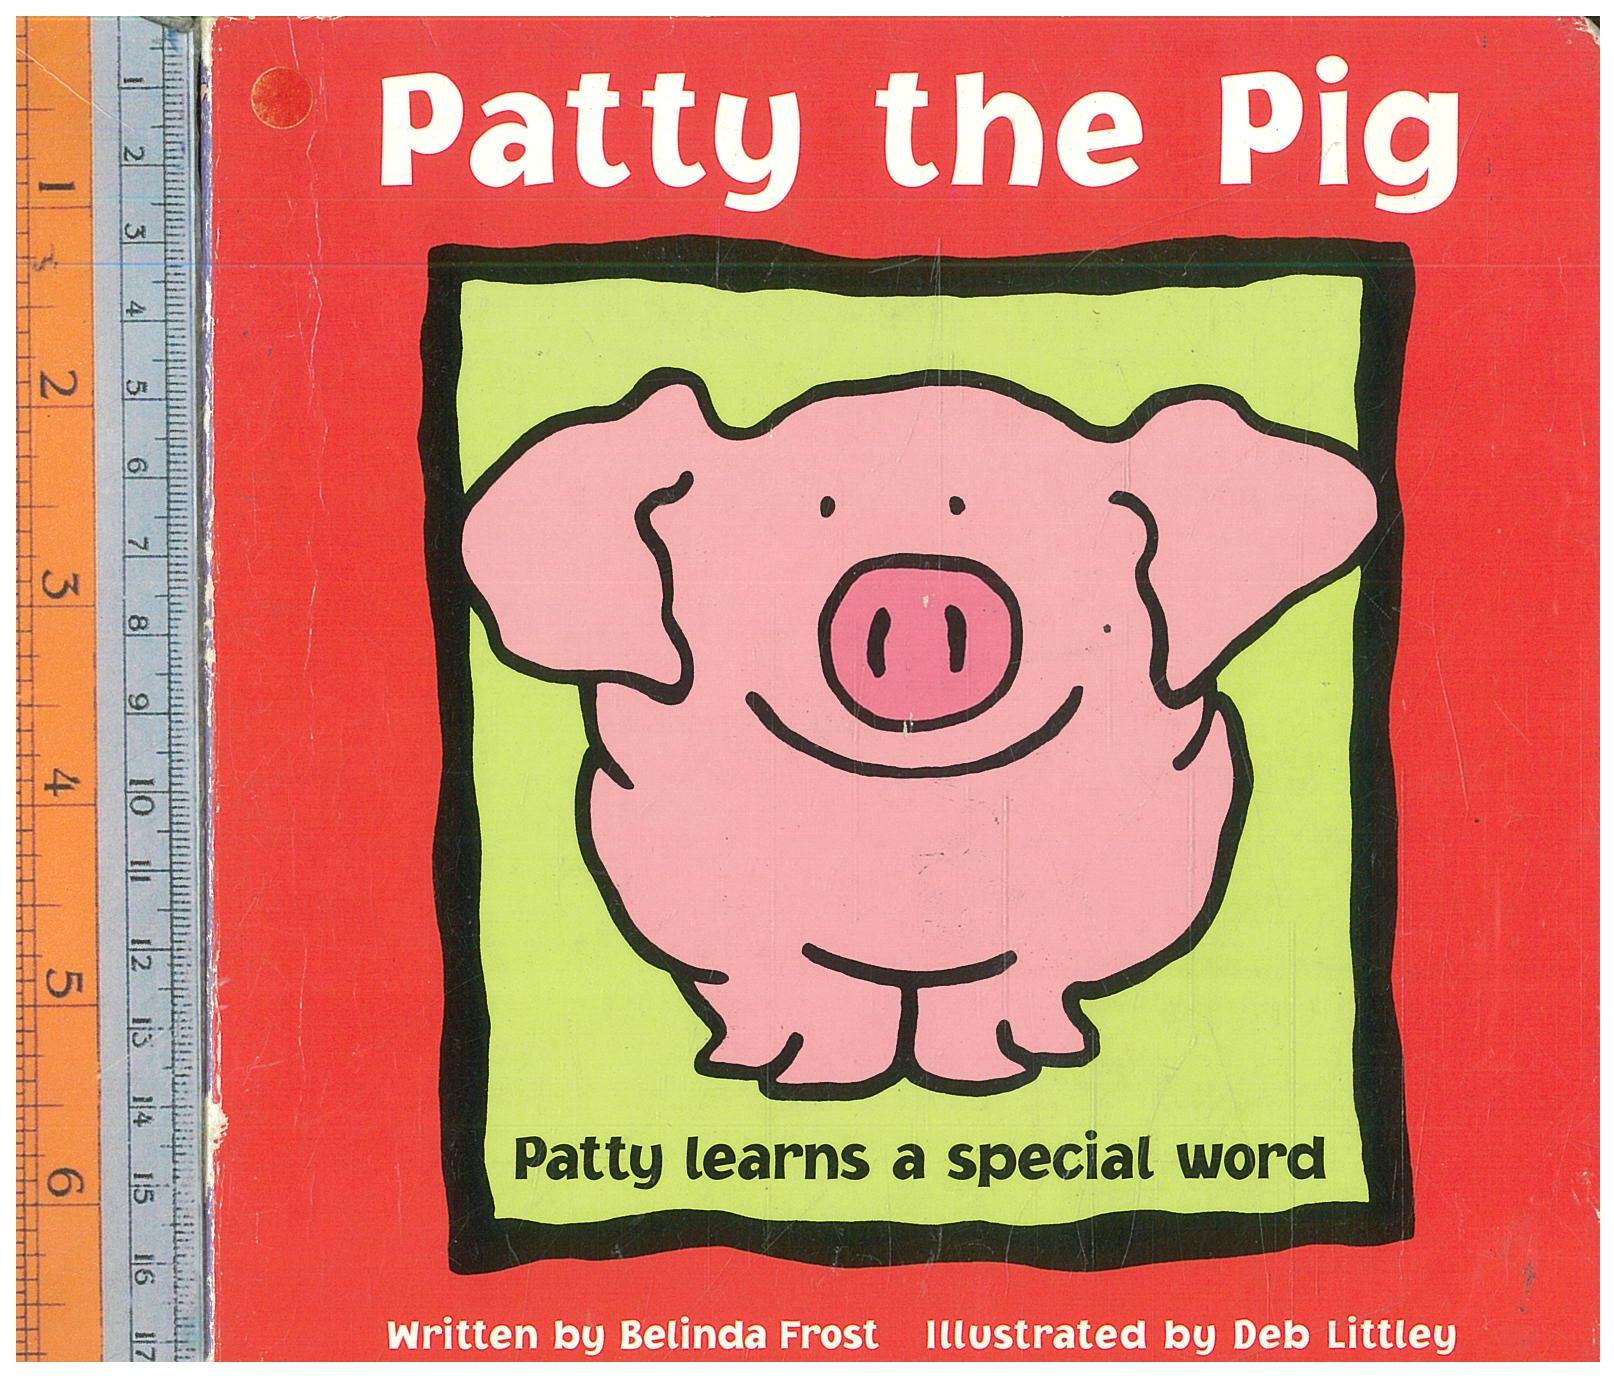 Patty the Pig